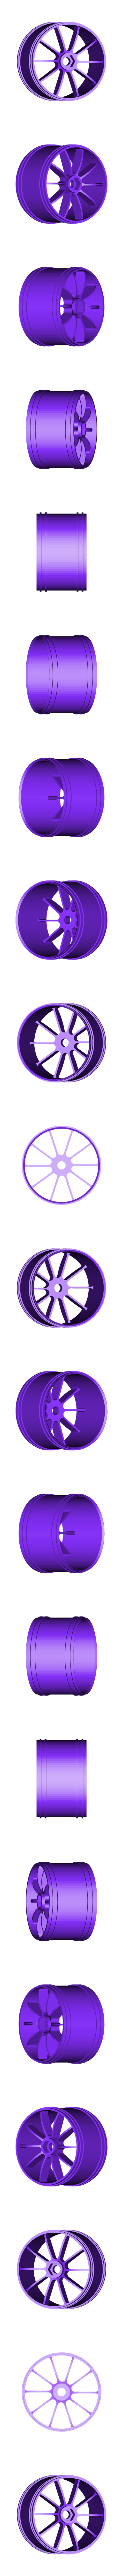 rear_rim_for_rubber_tire_test.stl Download free STL file 2016 Ducati Draxter Concept Drag Bike RC • 3D printer template, brett